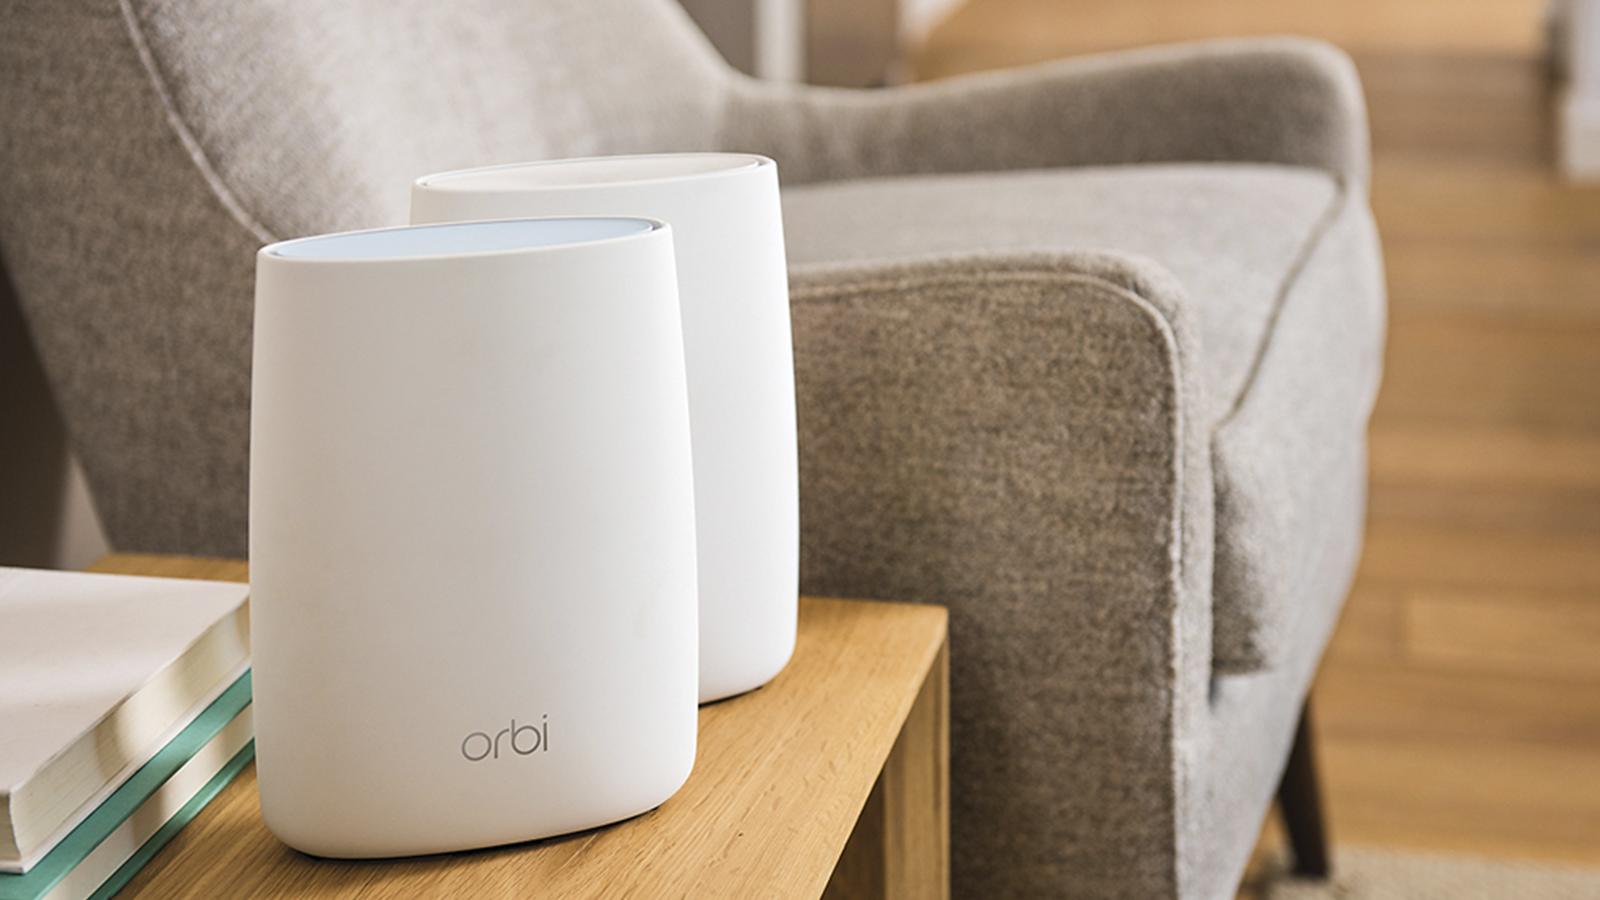 Mesh Wi-Fi 系統,慵懶周末也能輕鬆架設